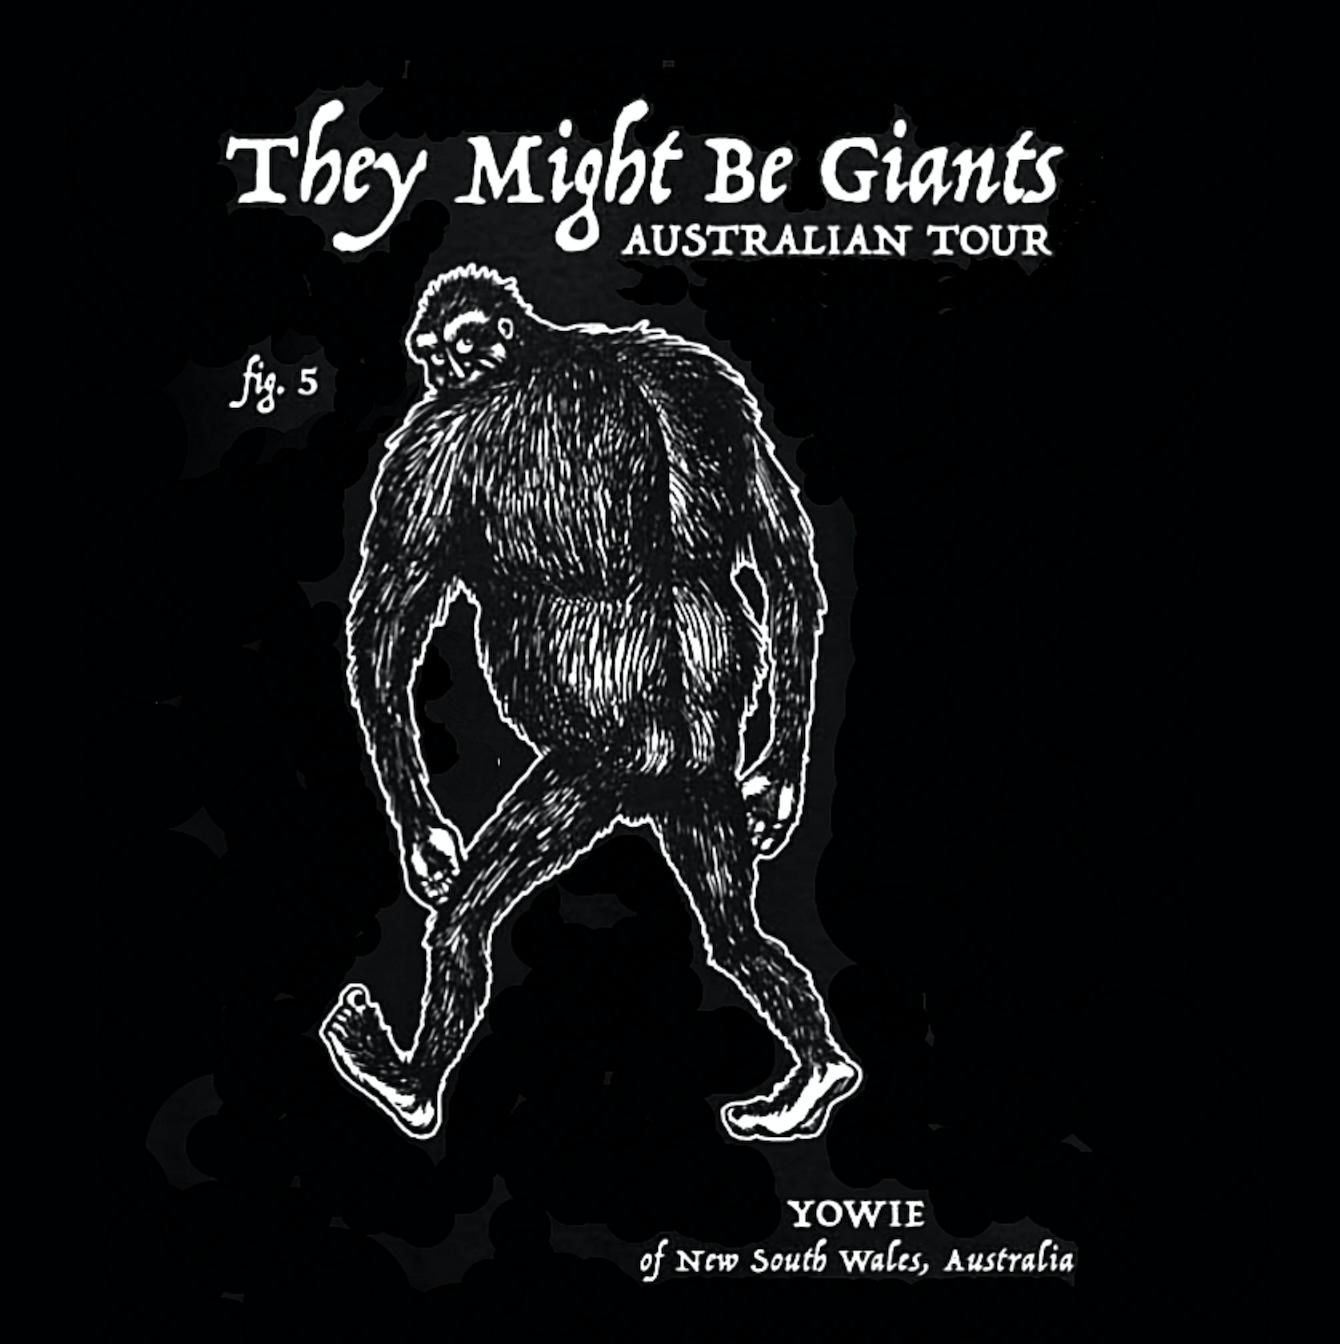 Australian Yowie TMBG poster.png